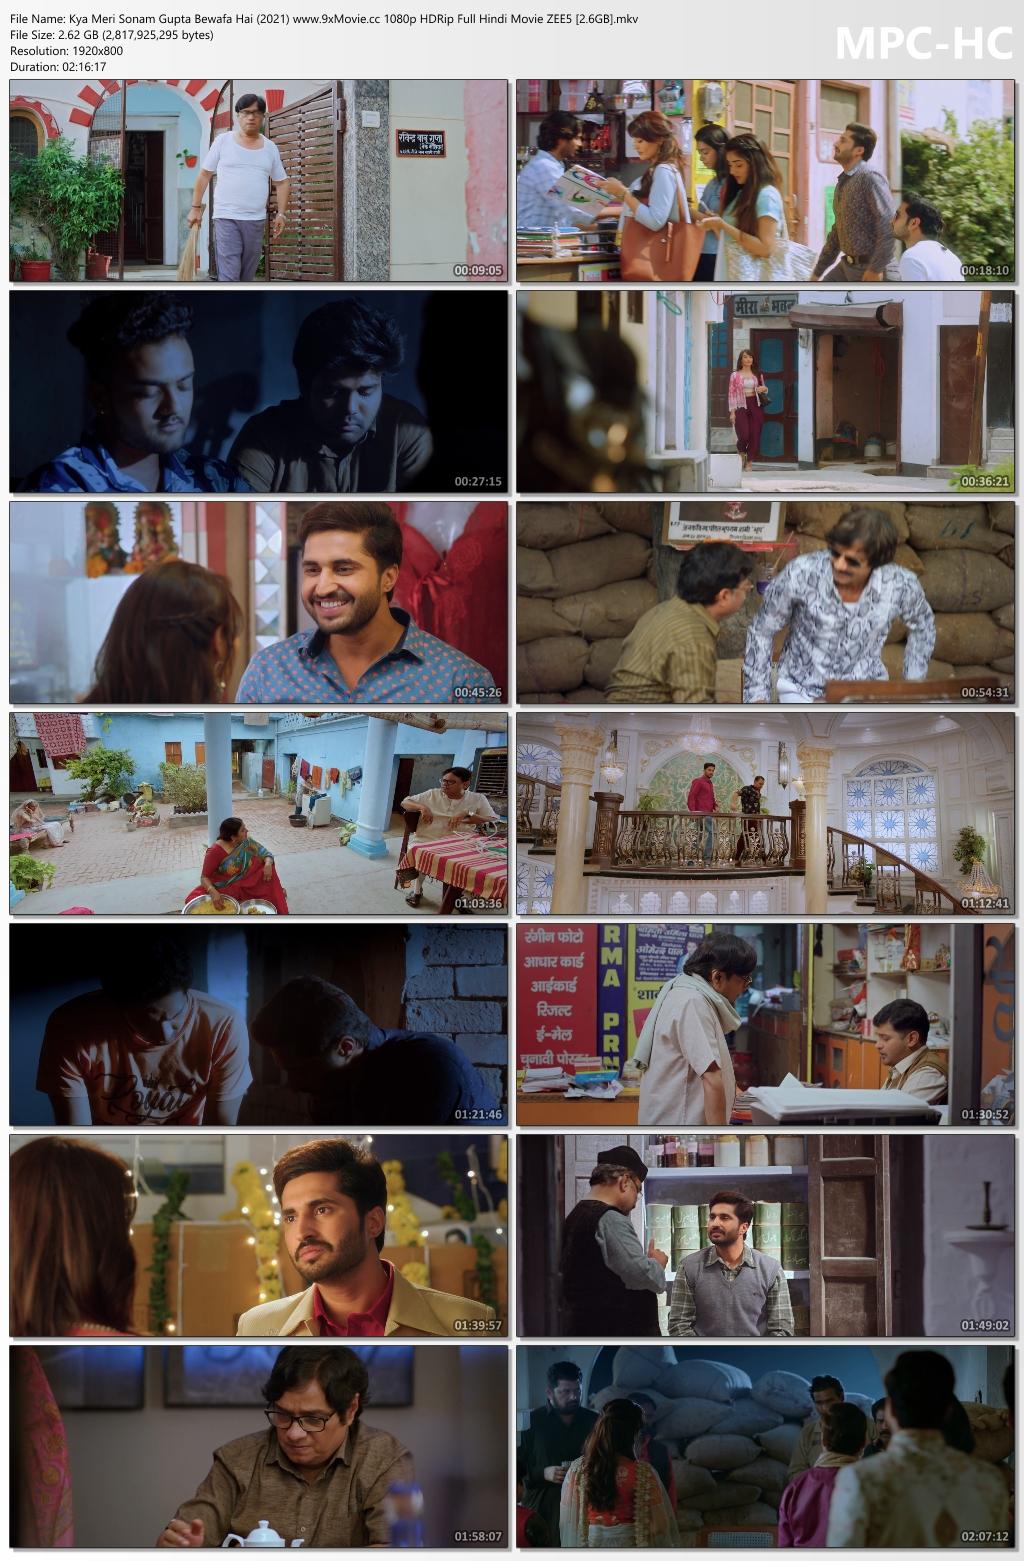 Kya-Meri-Sonam-Gupta-Bewafa-Hai-2021-www-9x-Movie-cc-1080p-HDRip-Full-Hindi-Movie-ZEE5-2-6-GB-mkv